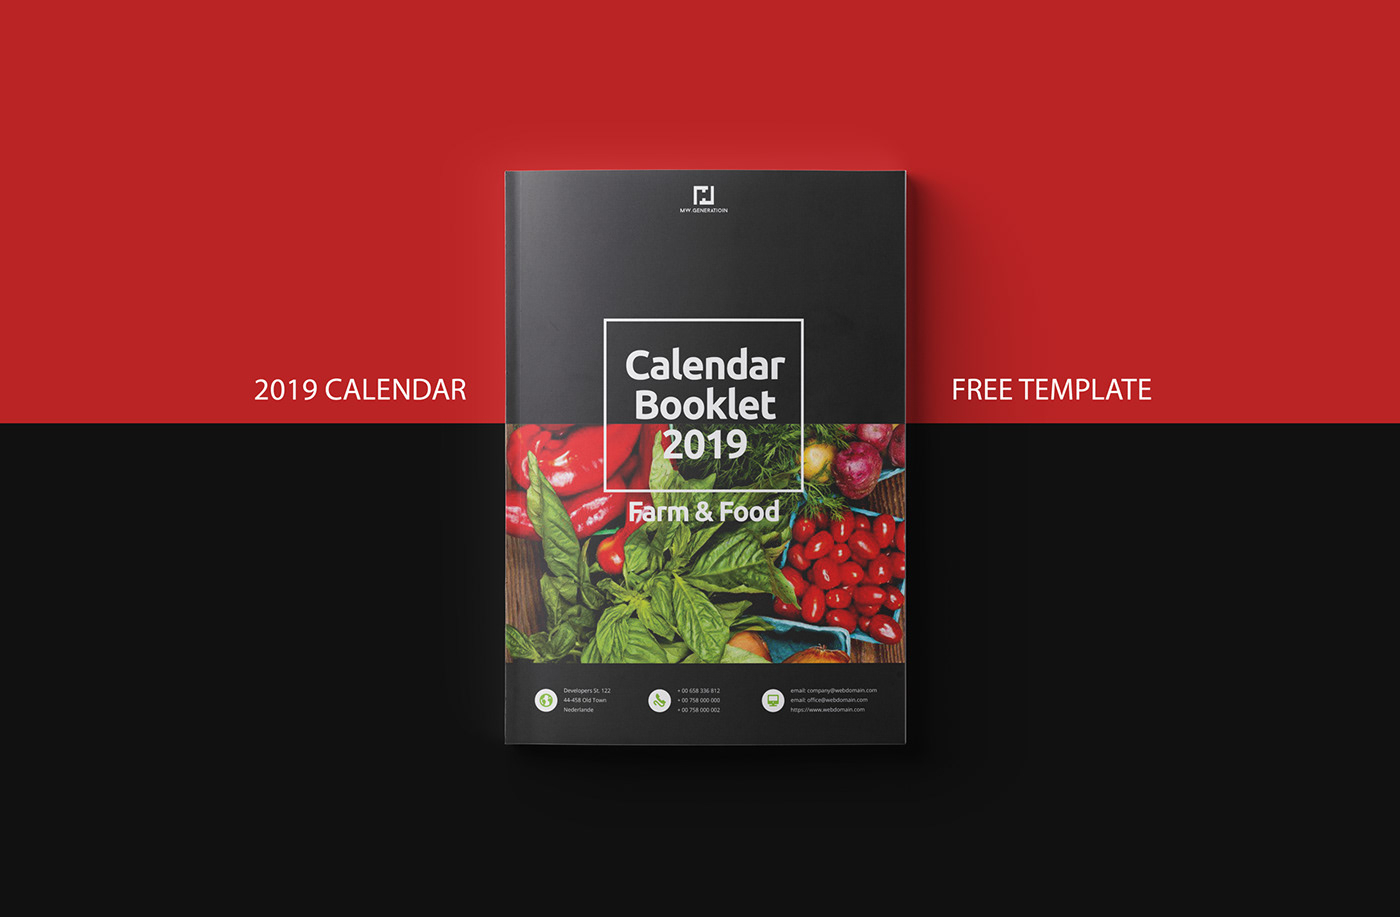 Free Calendar 2019 Indesign Template On Behance